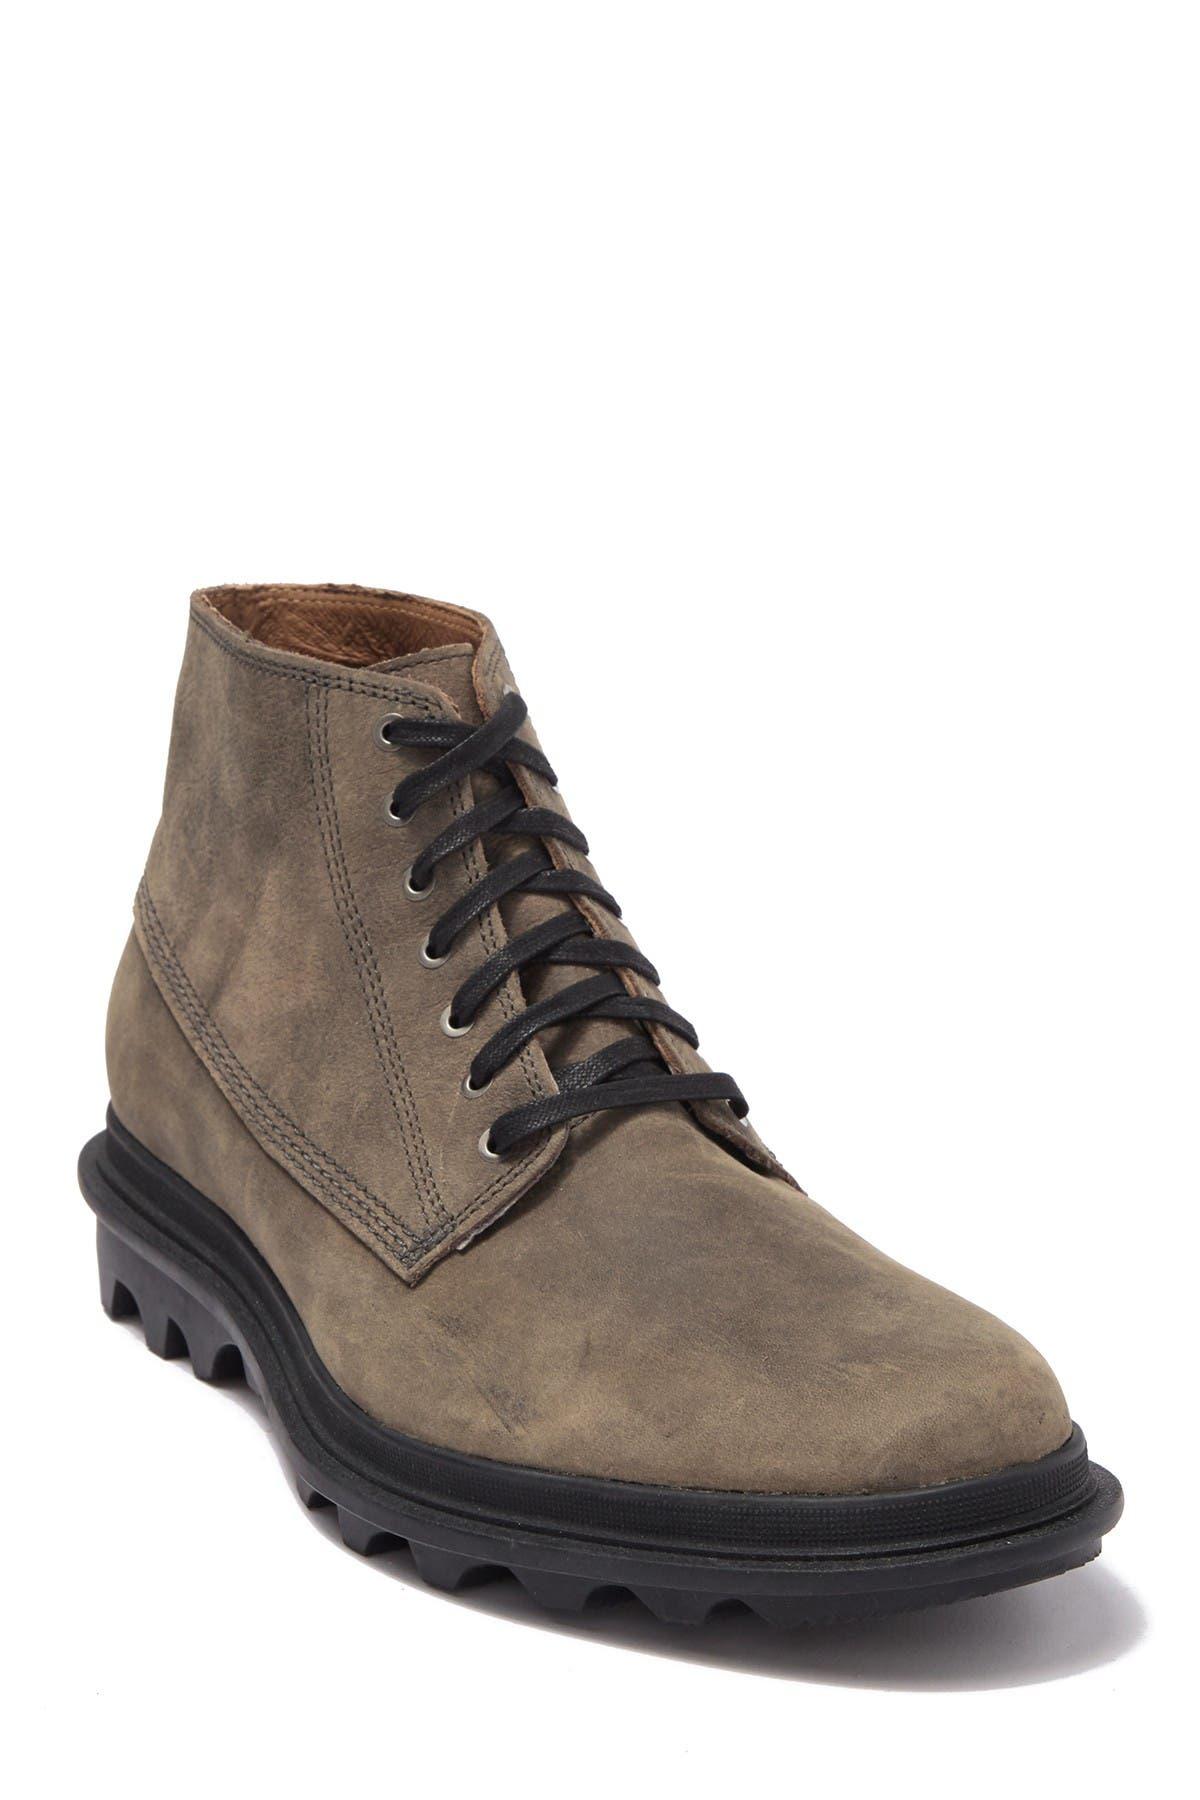 New Men`s Sorel Ace Chukka  Waterproof Full Grain Leather Boot